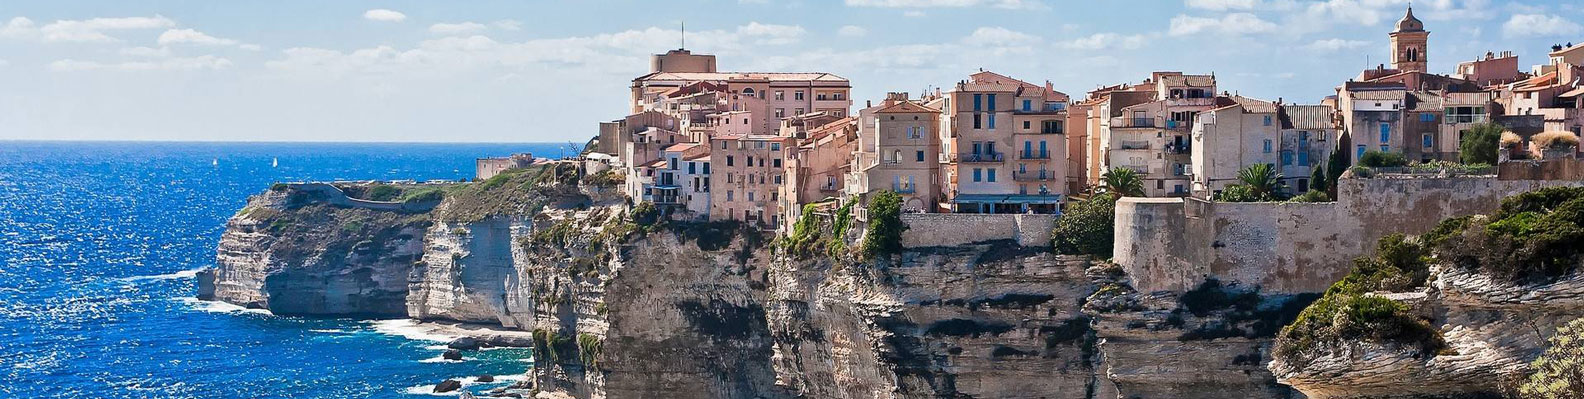 Bonifacio, Sardegna and Corsica Header